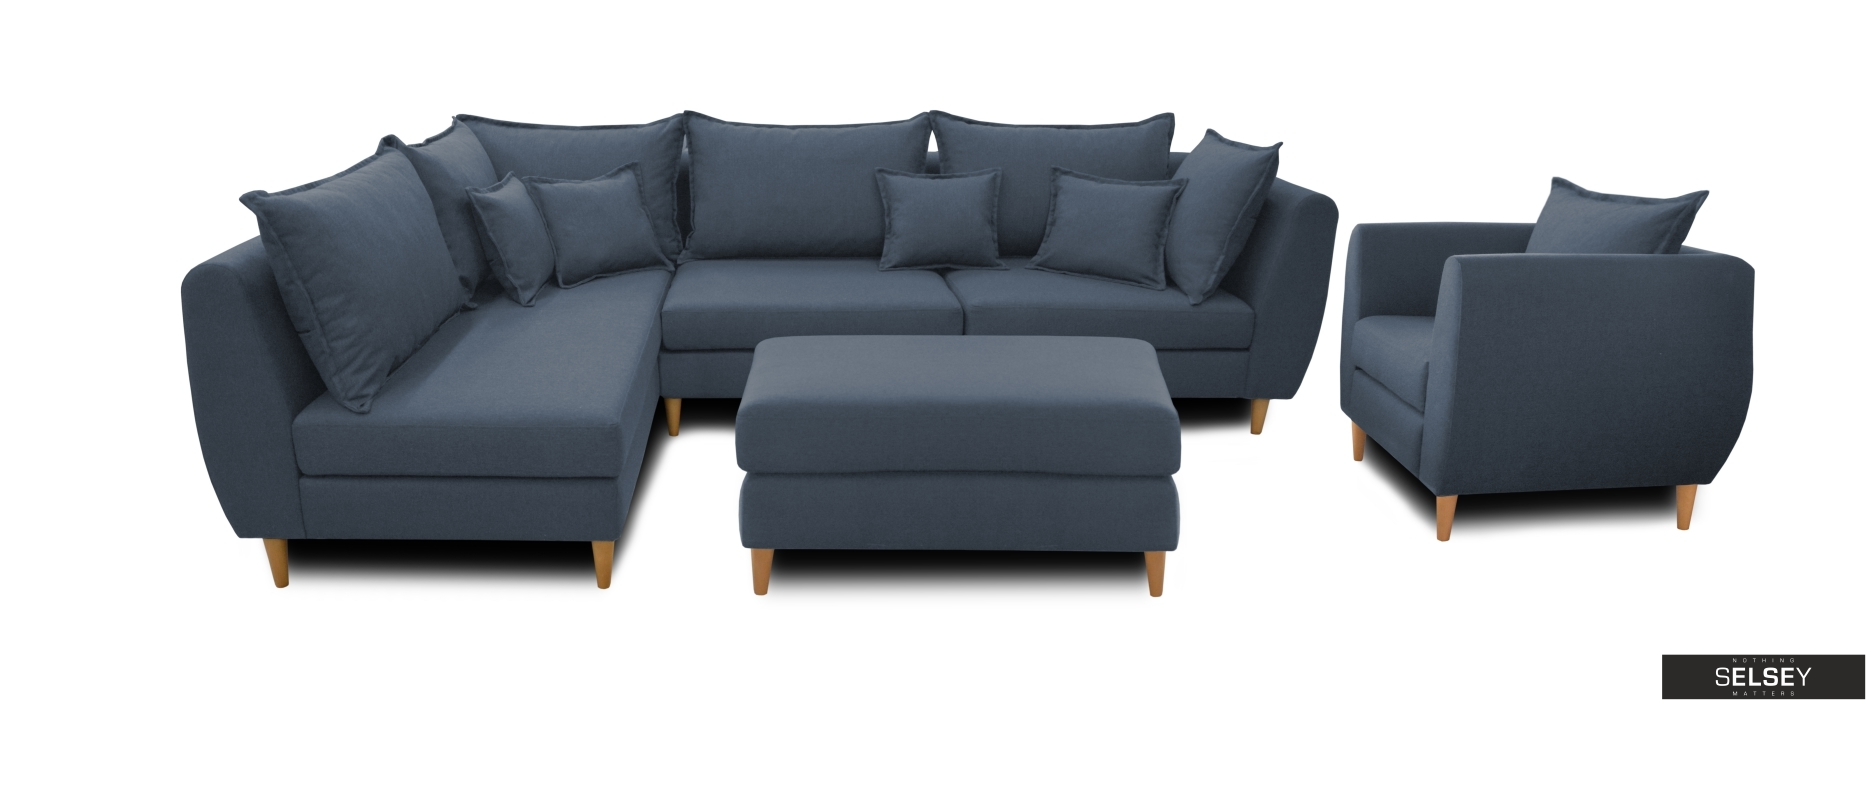 sitzgruppe bornholm mit ecksofa sessel und hocker. Black Bedroom Furniture Sets. Home Design Ideas